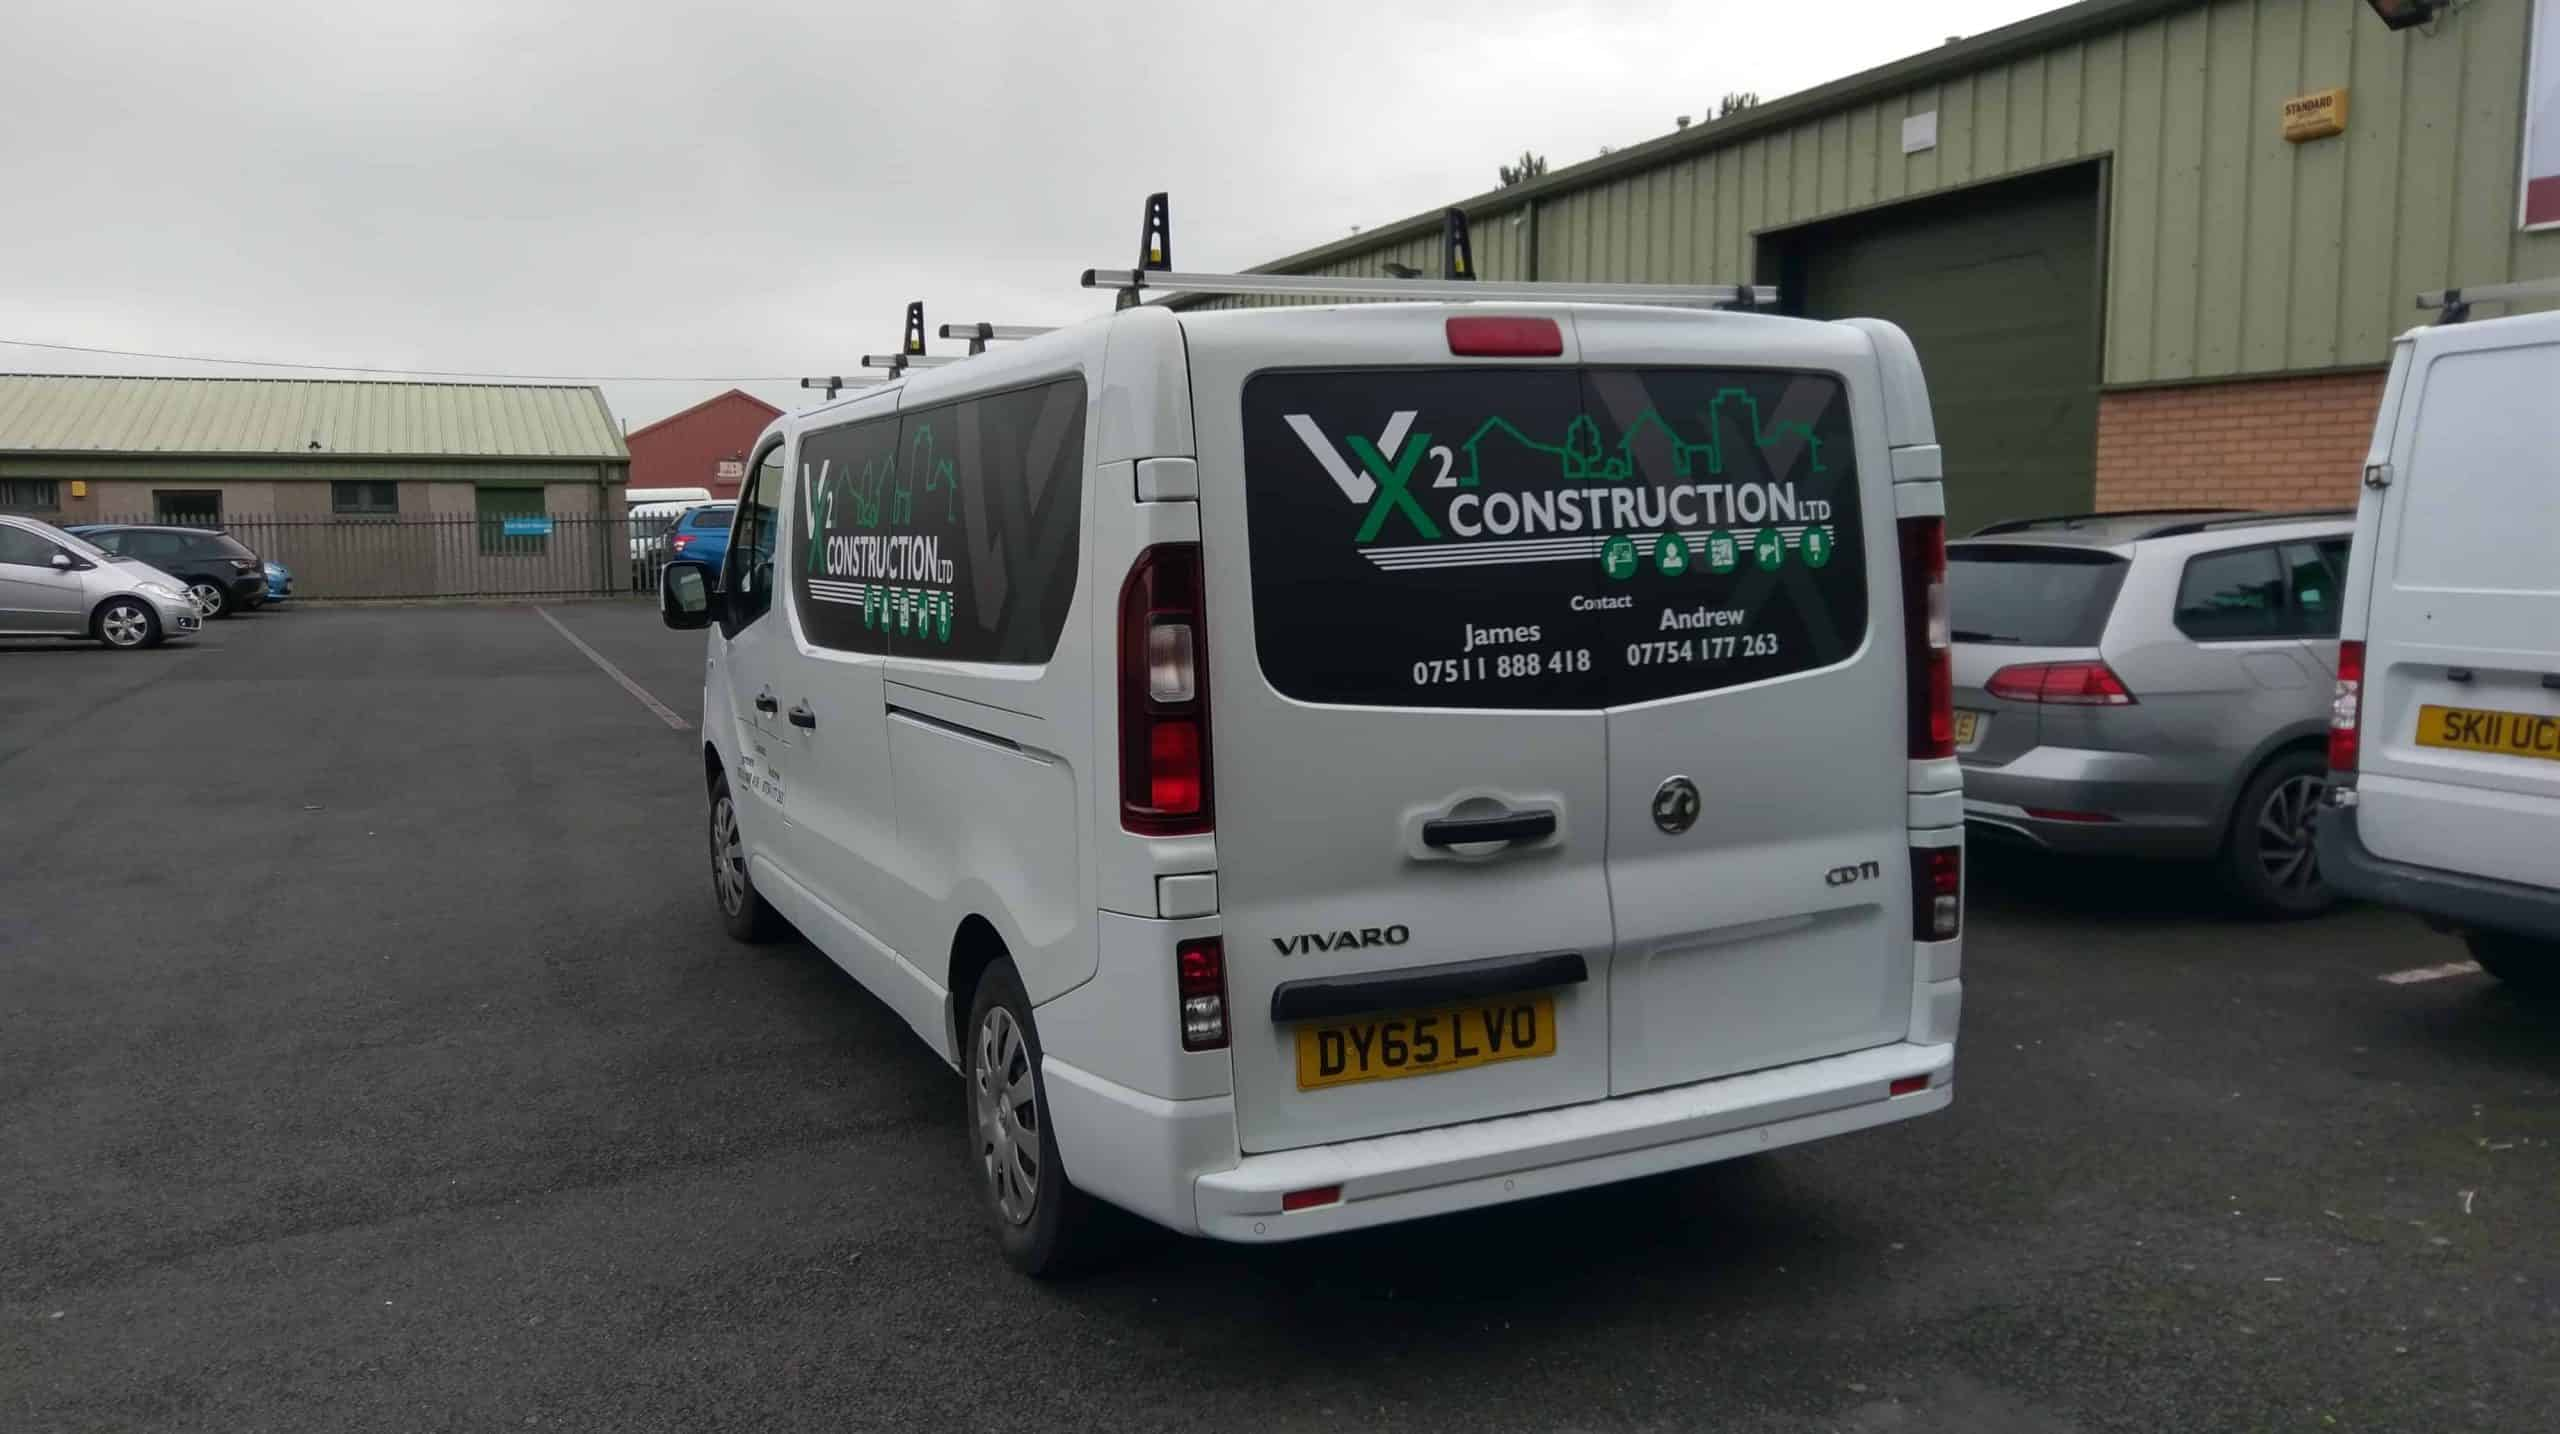 VX2 Construction New Van Livery